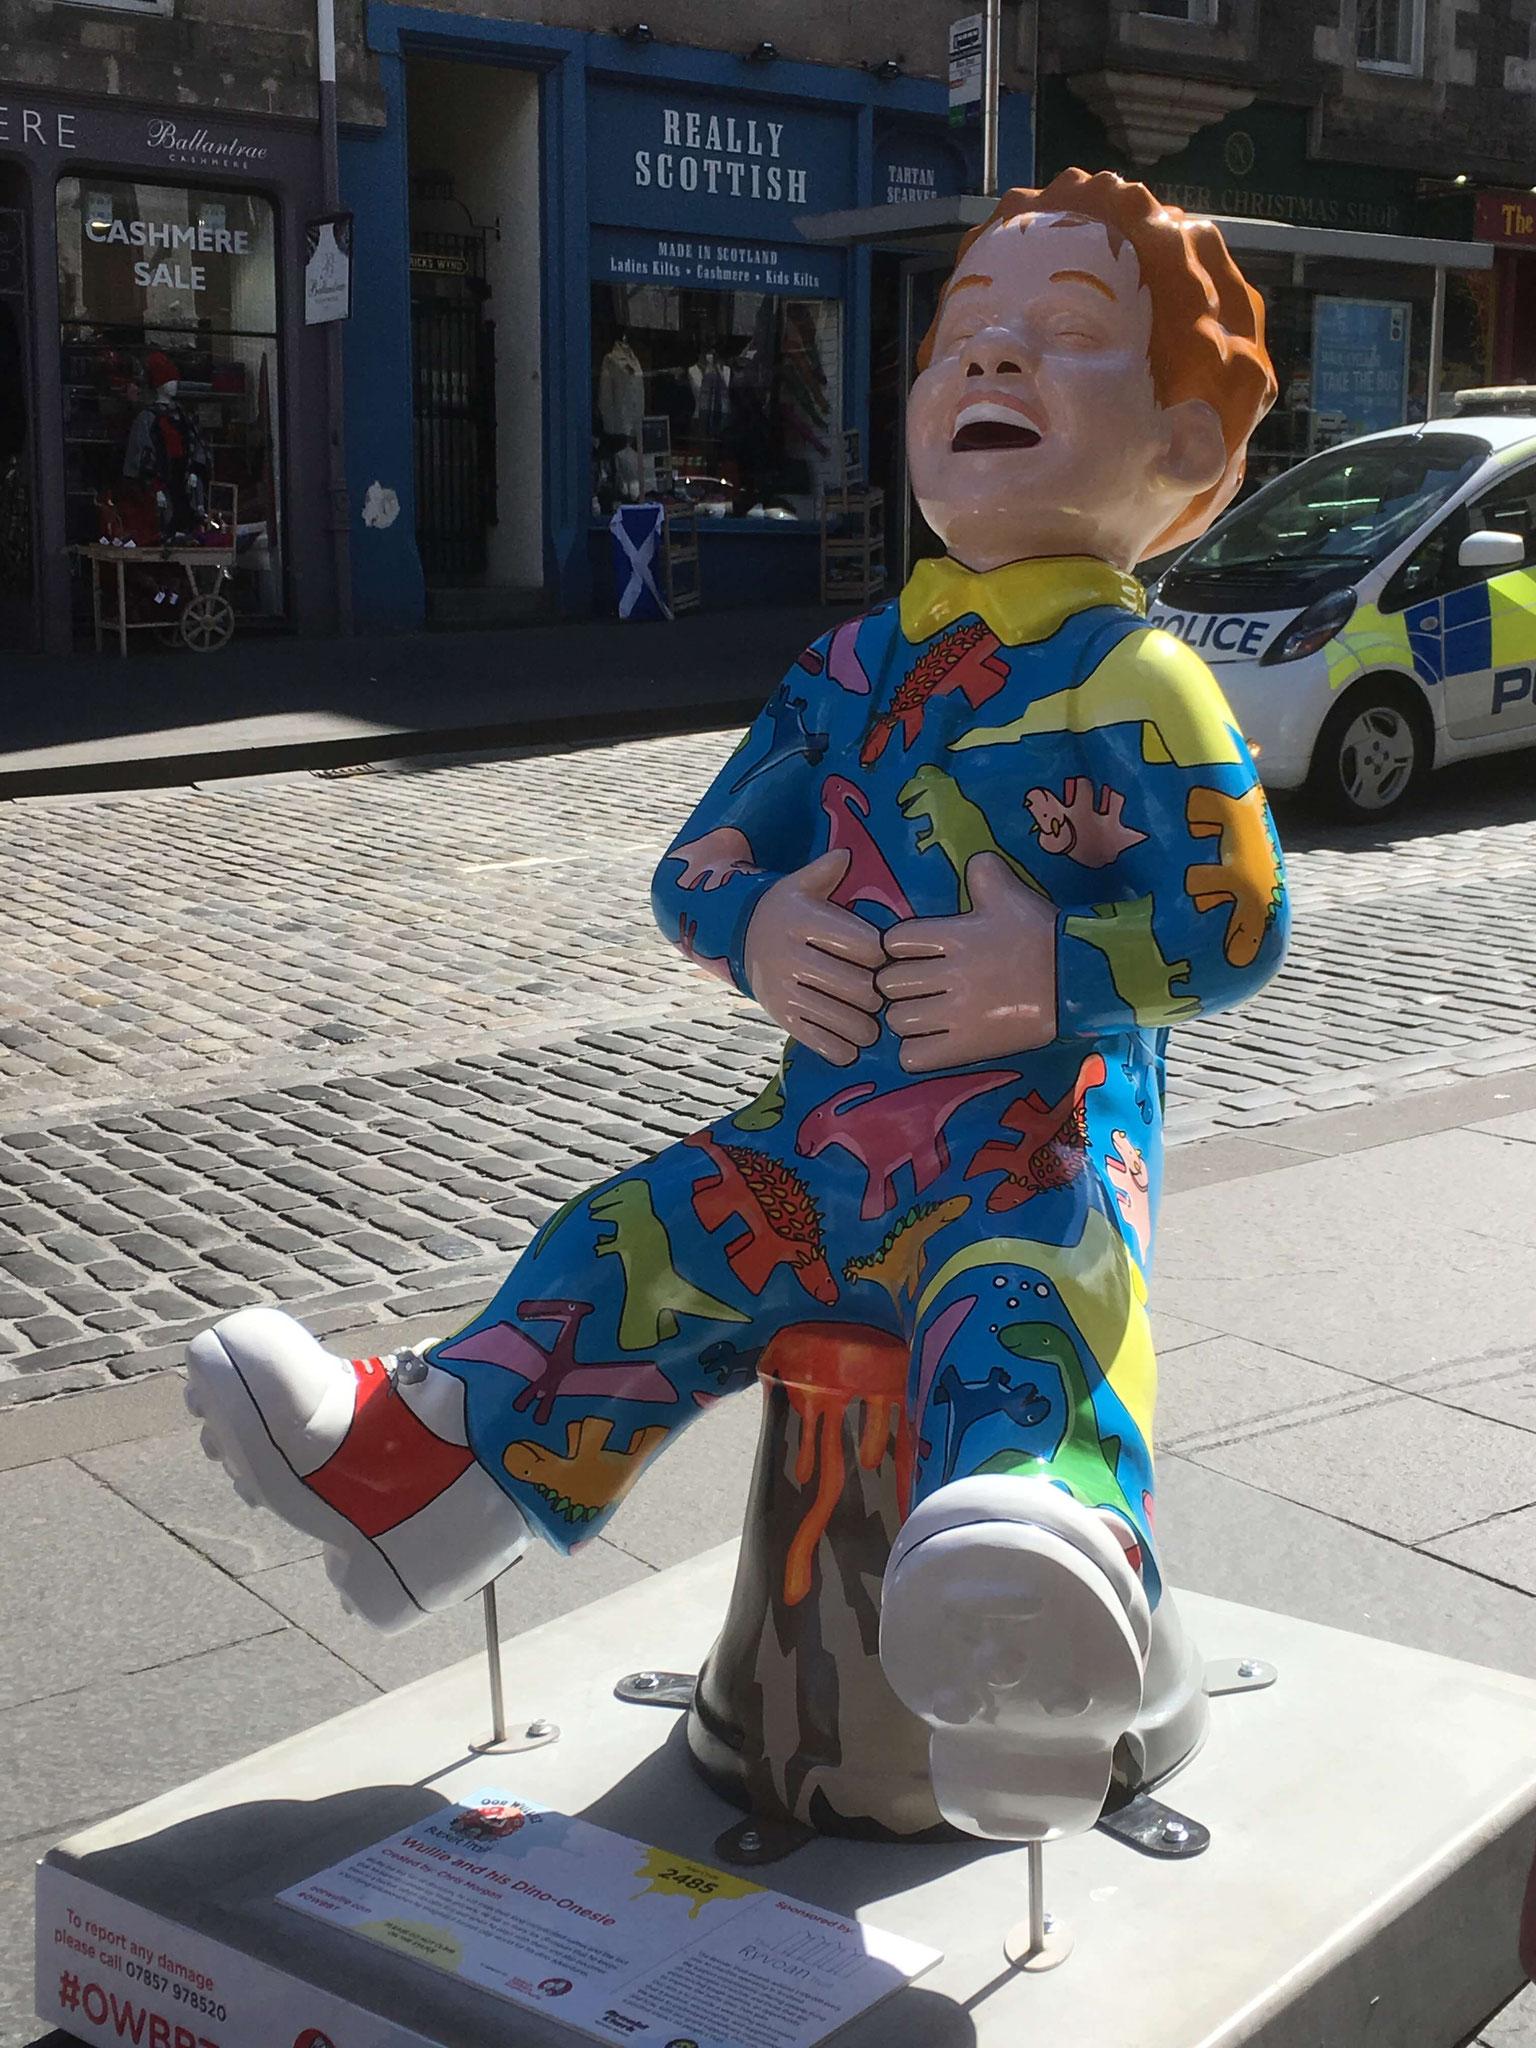 Oor Wullie on the Royal Mile